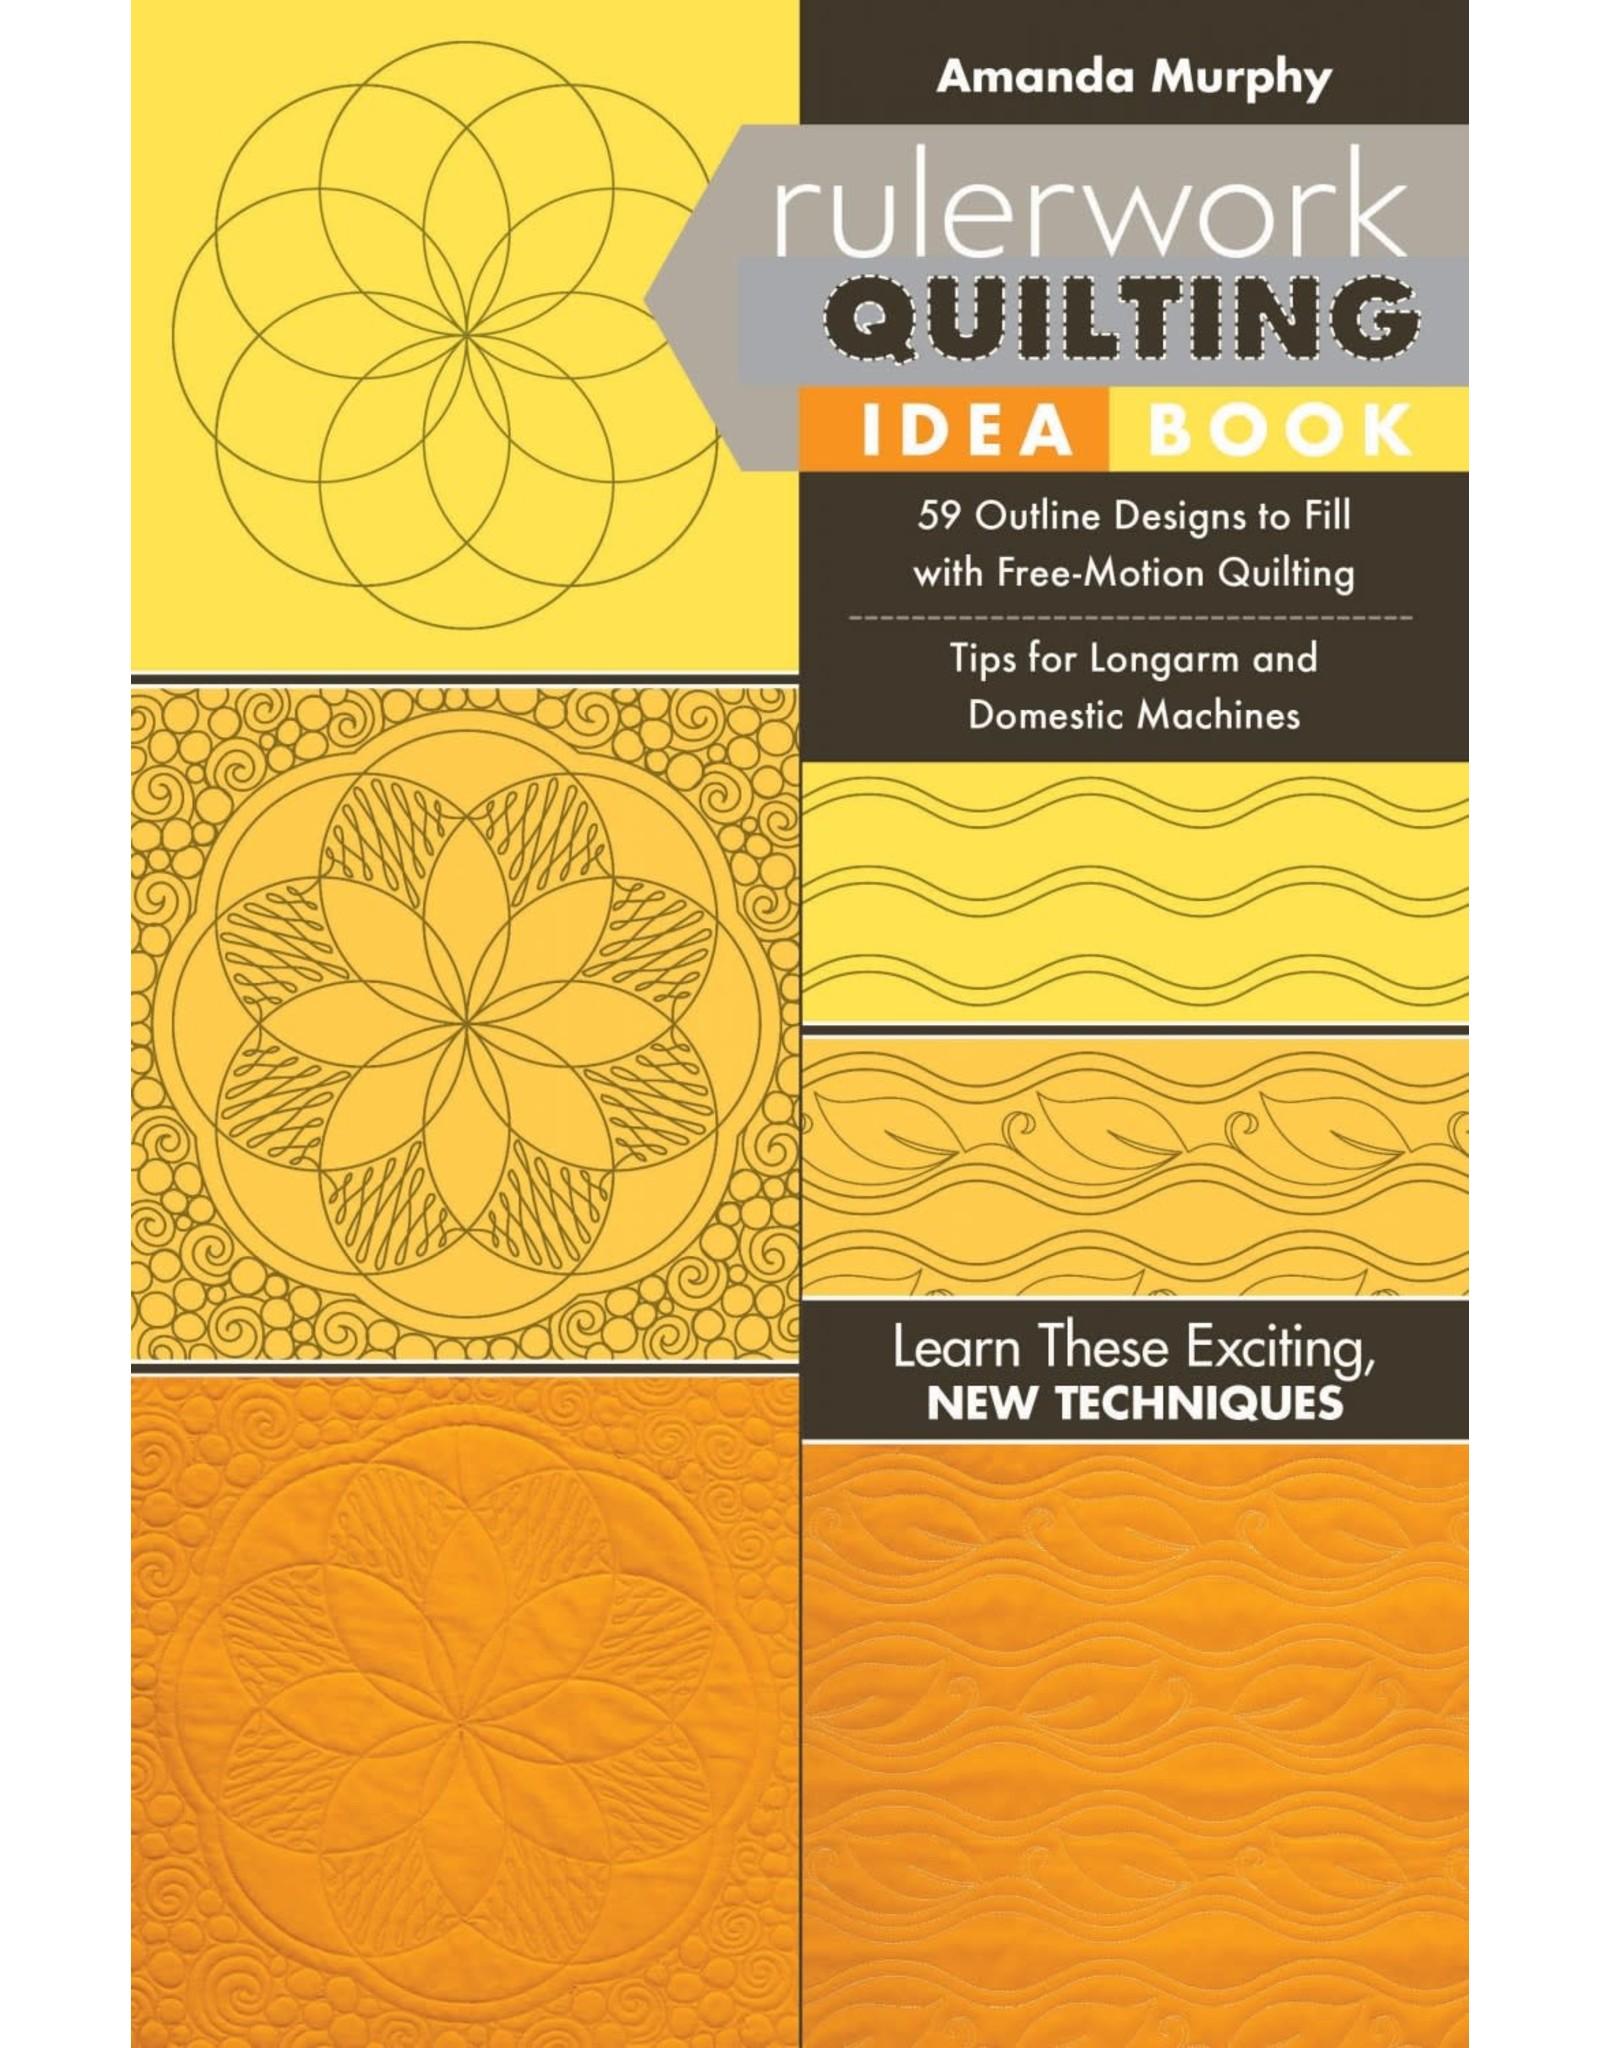 Rulerwork Quilting Idea Book - Amanda Murphy